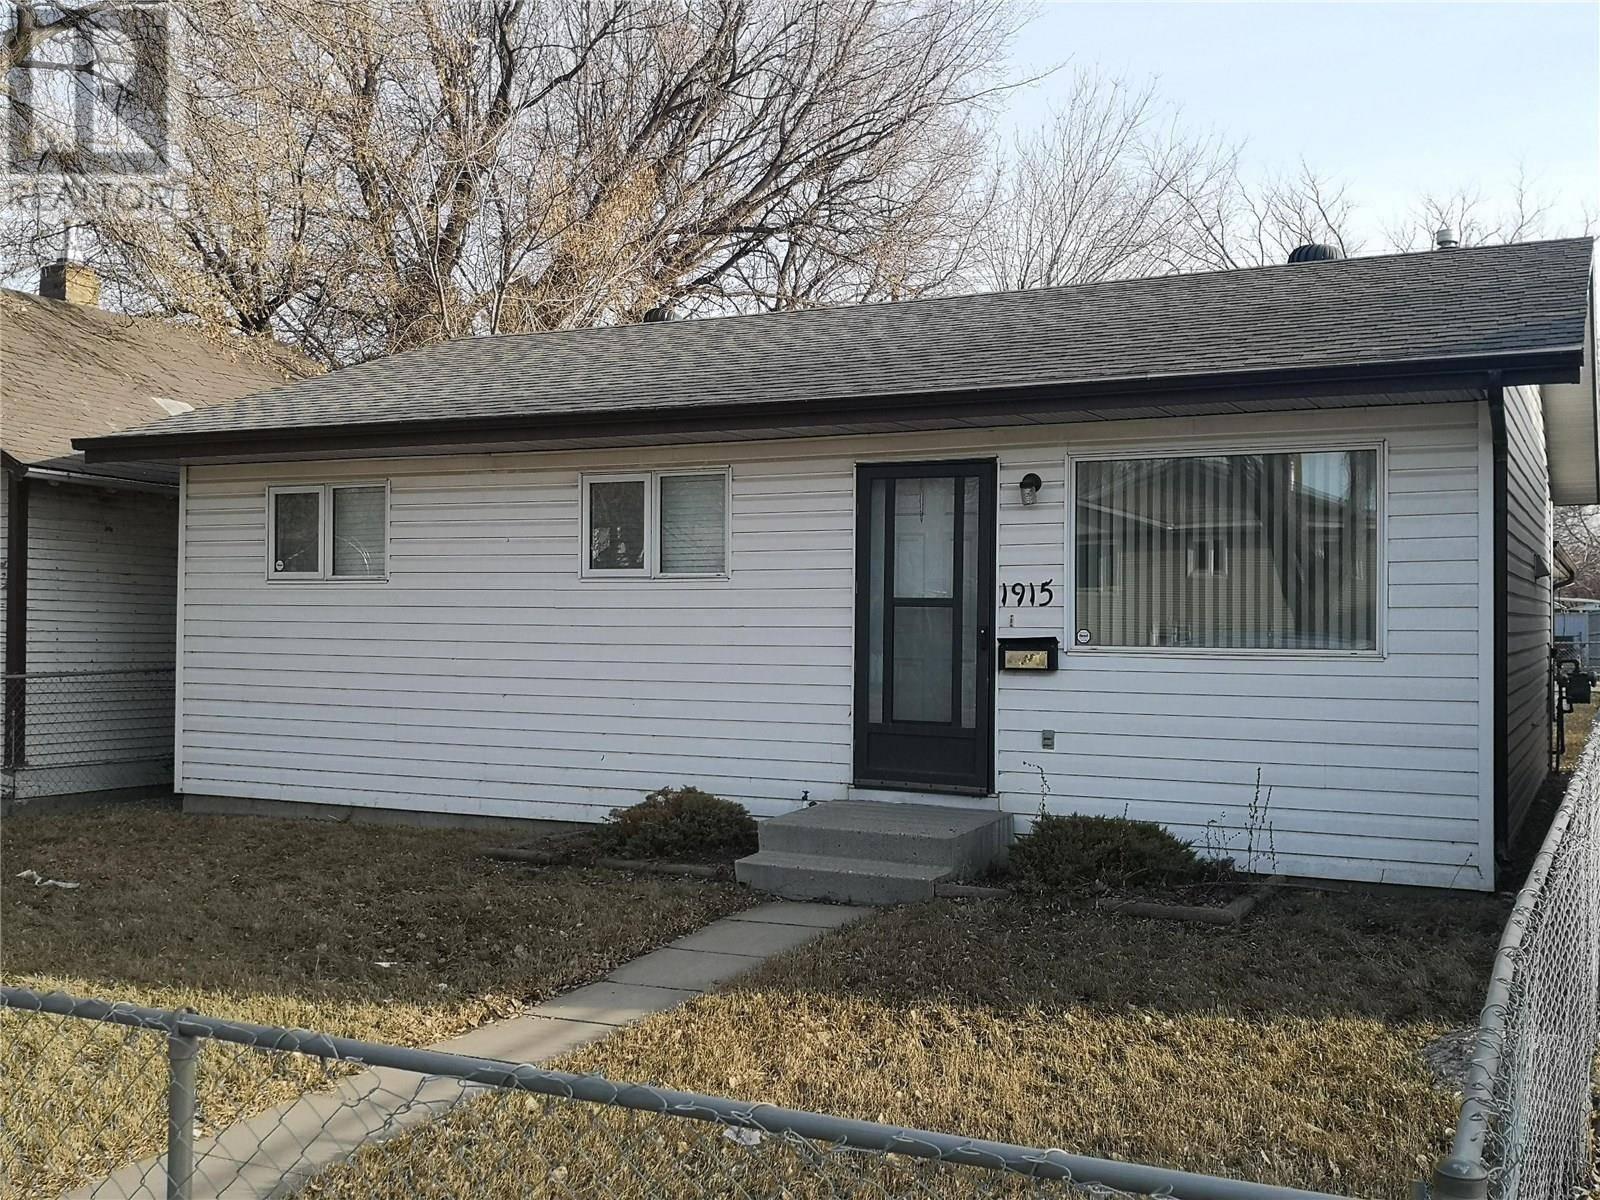 House for sale at 1915 20th St W Saskatoon Saskatchewan - MLS: SK785676